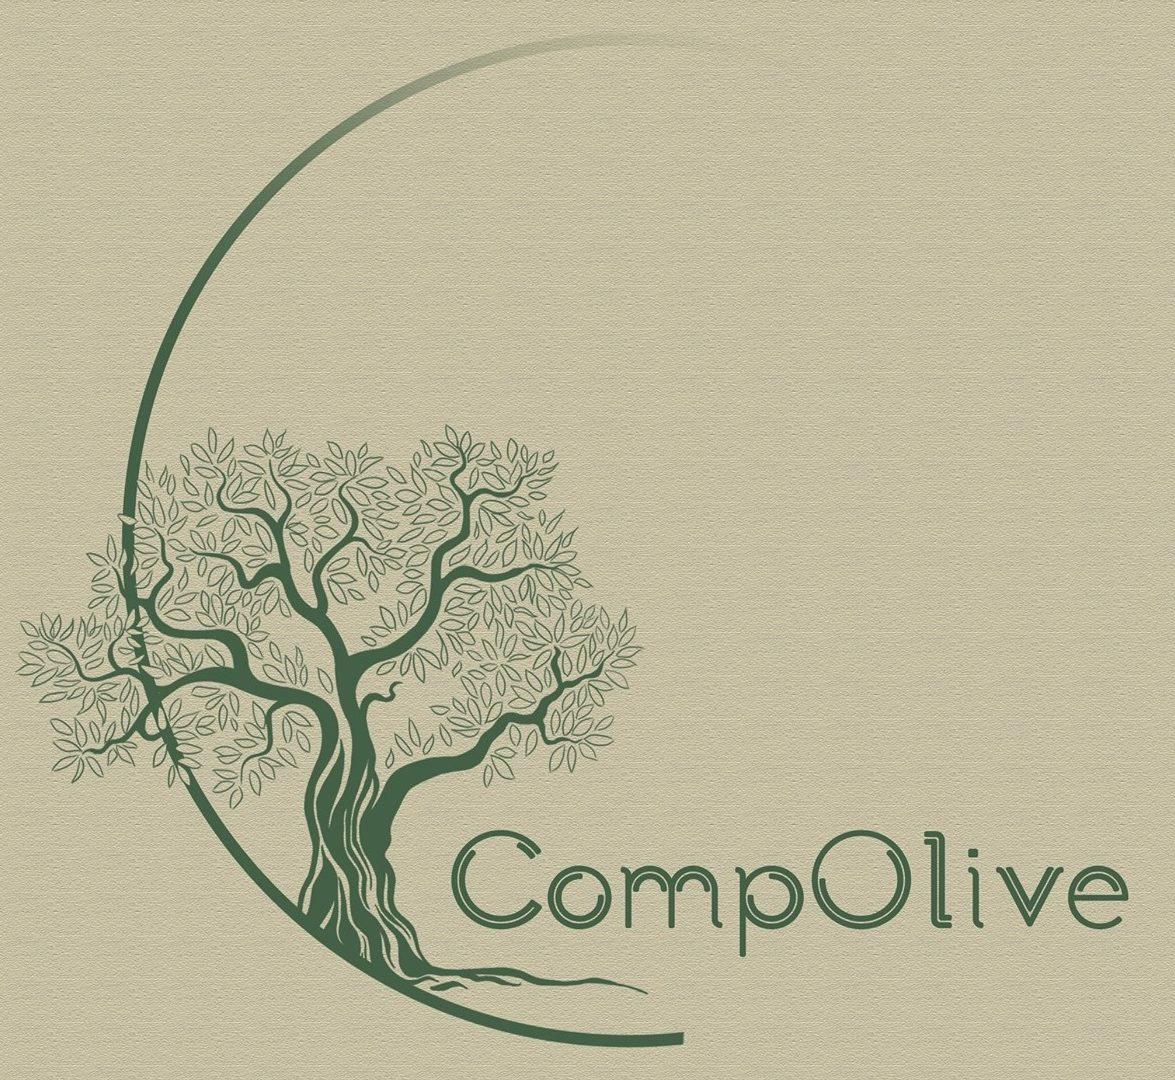 CompOlive